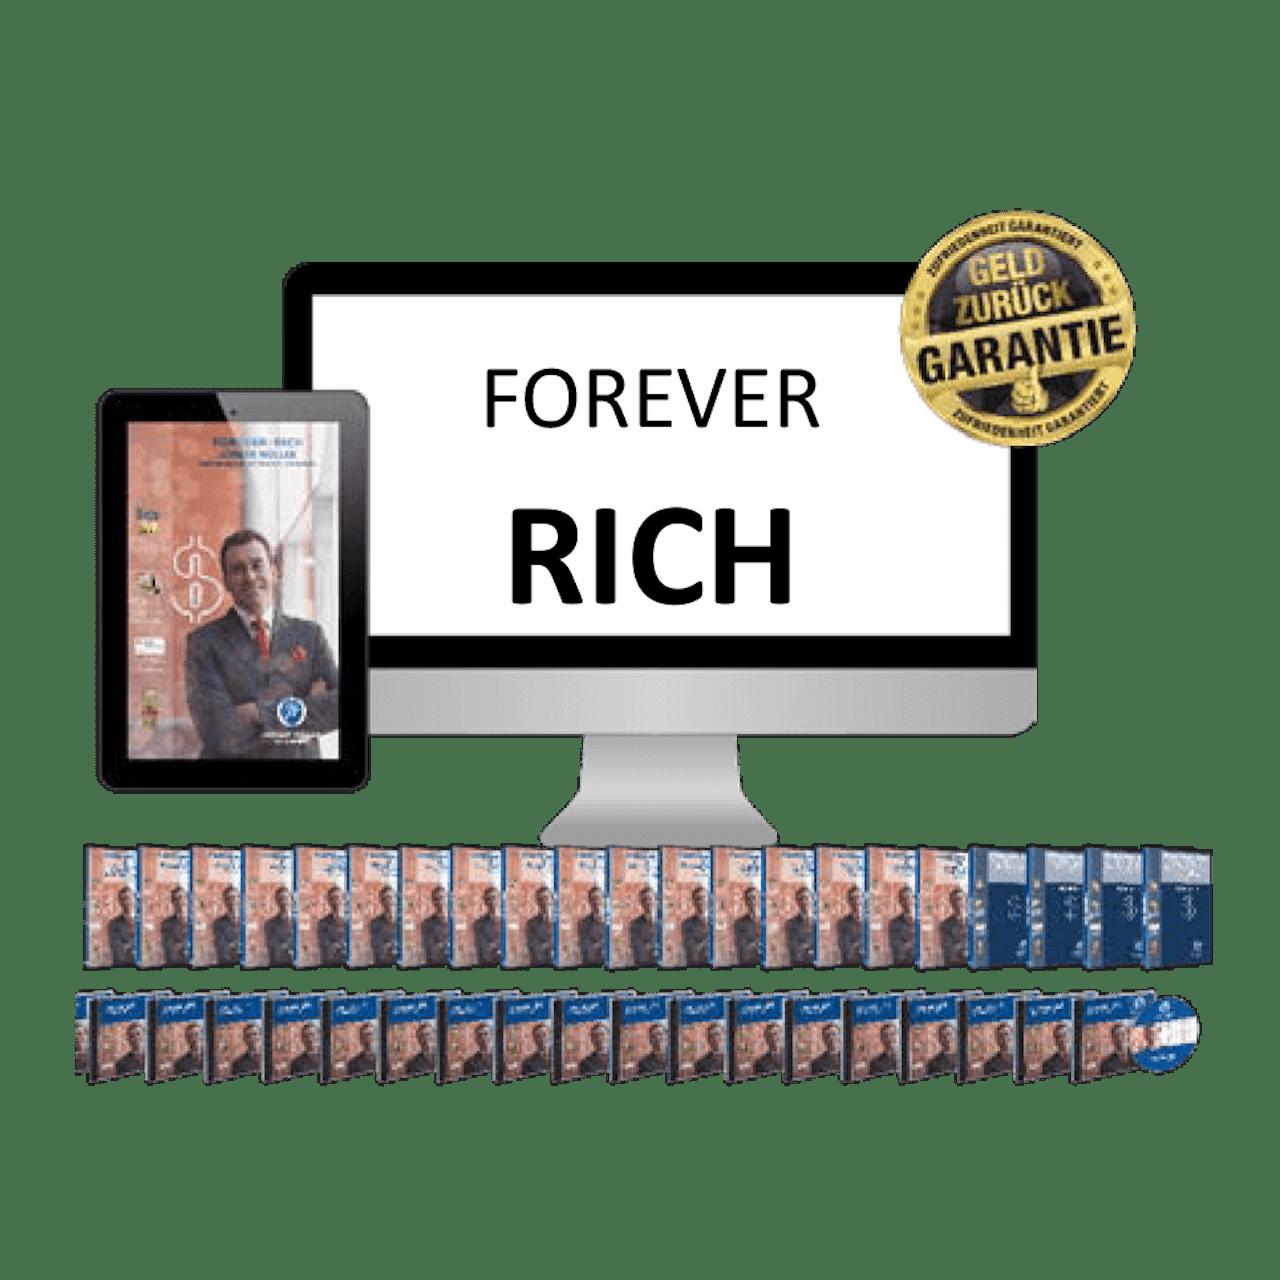 Forever Rich Reichtumskurs Jürgen Höller